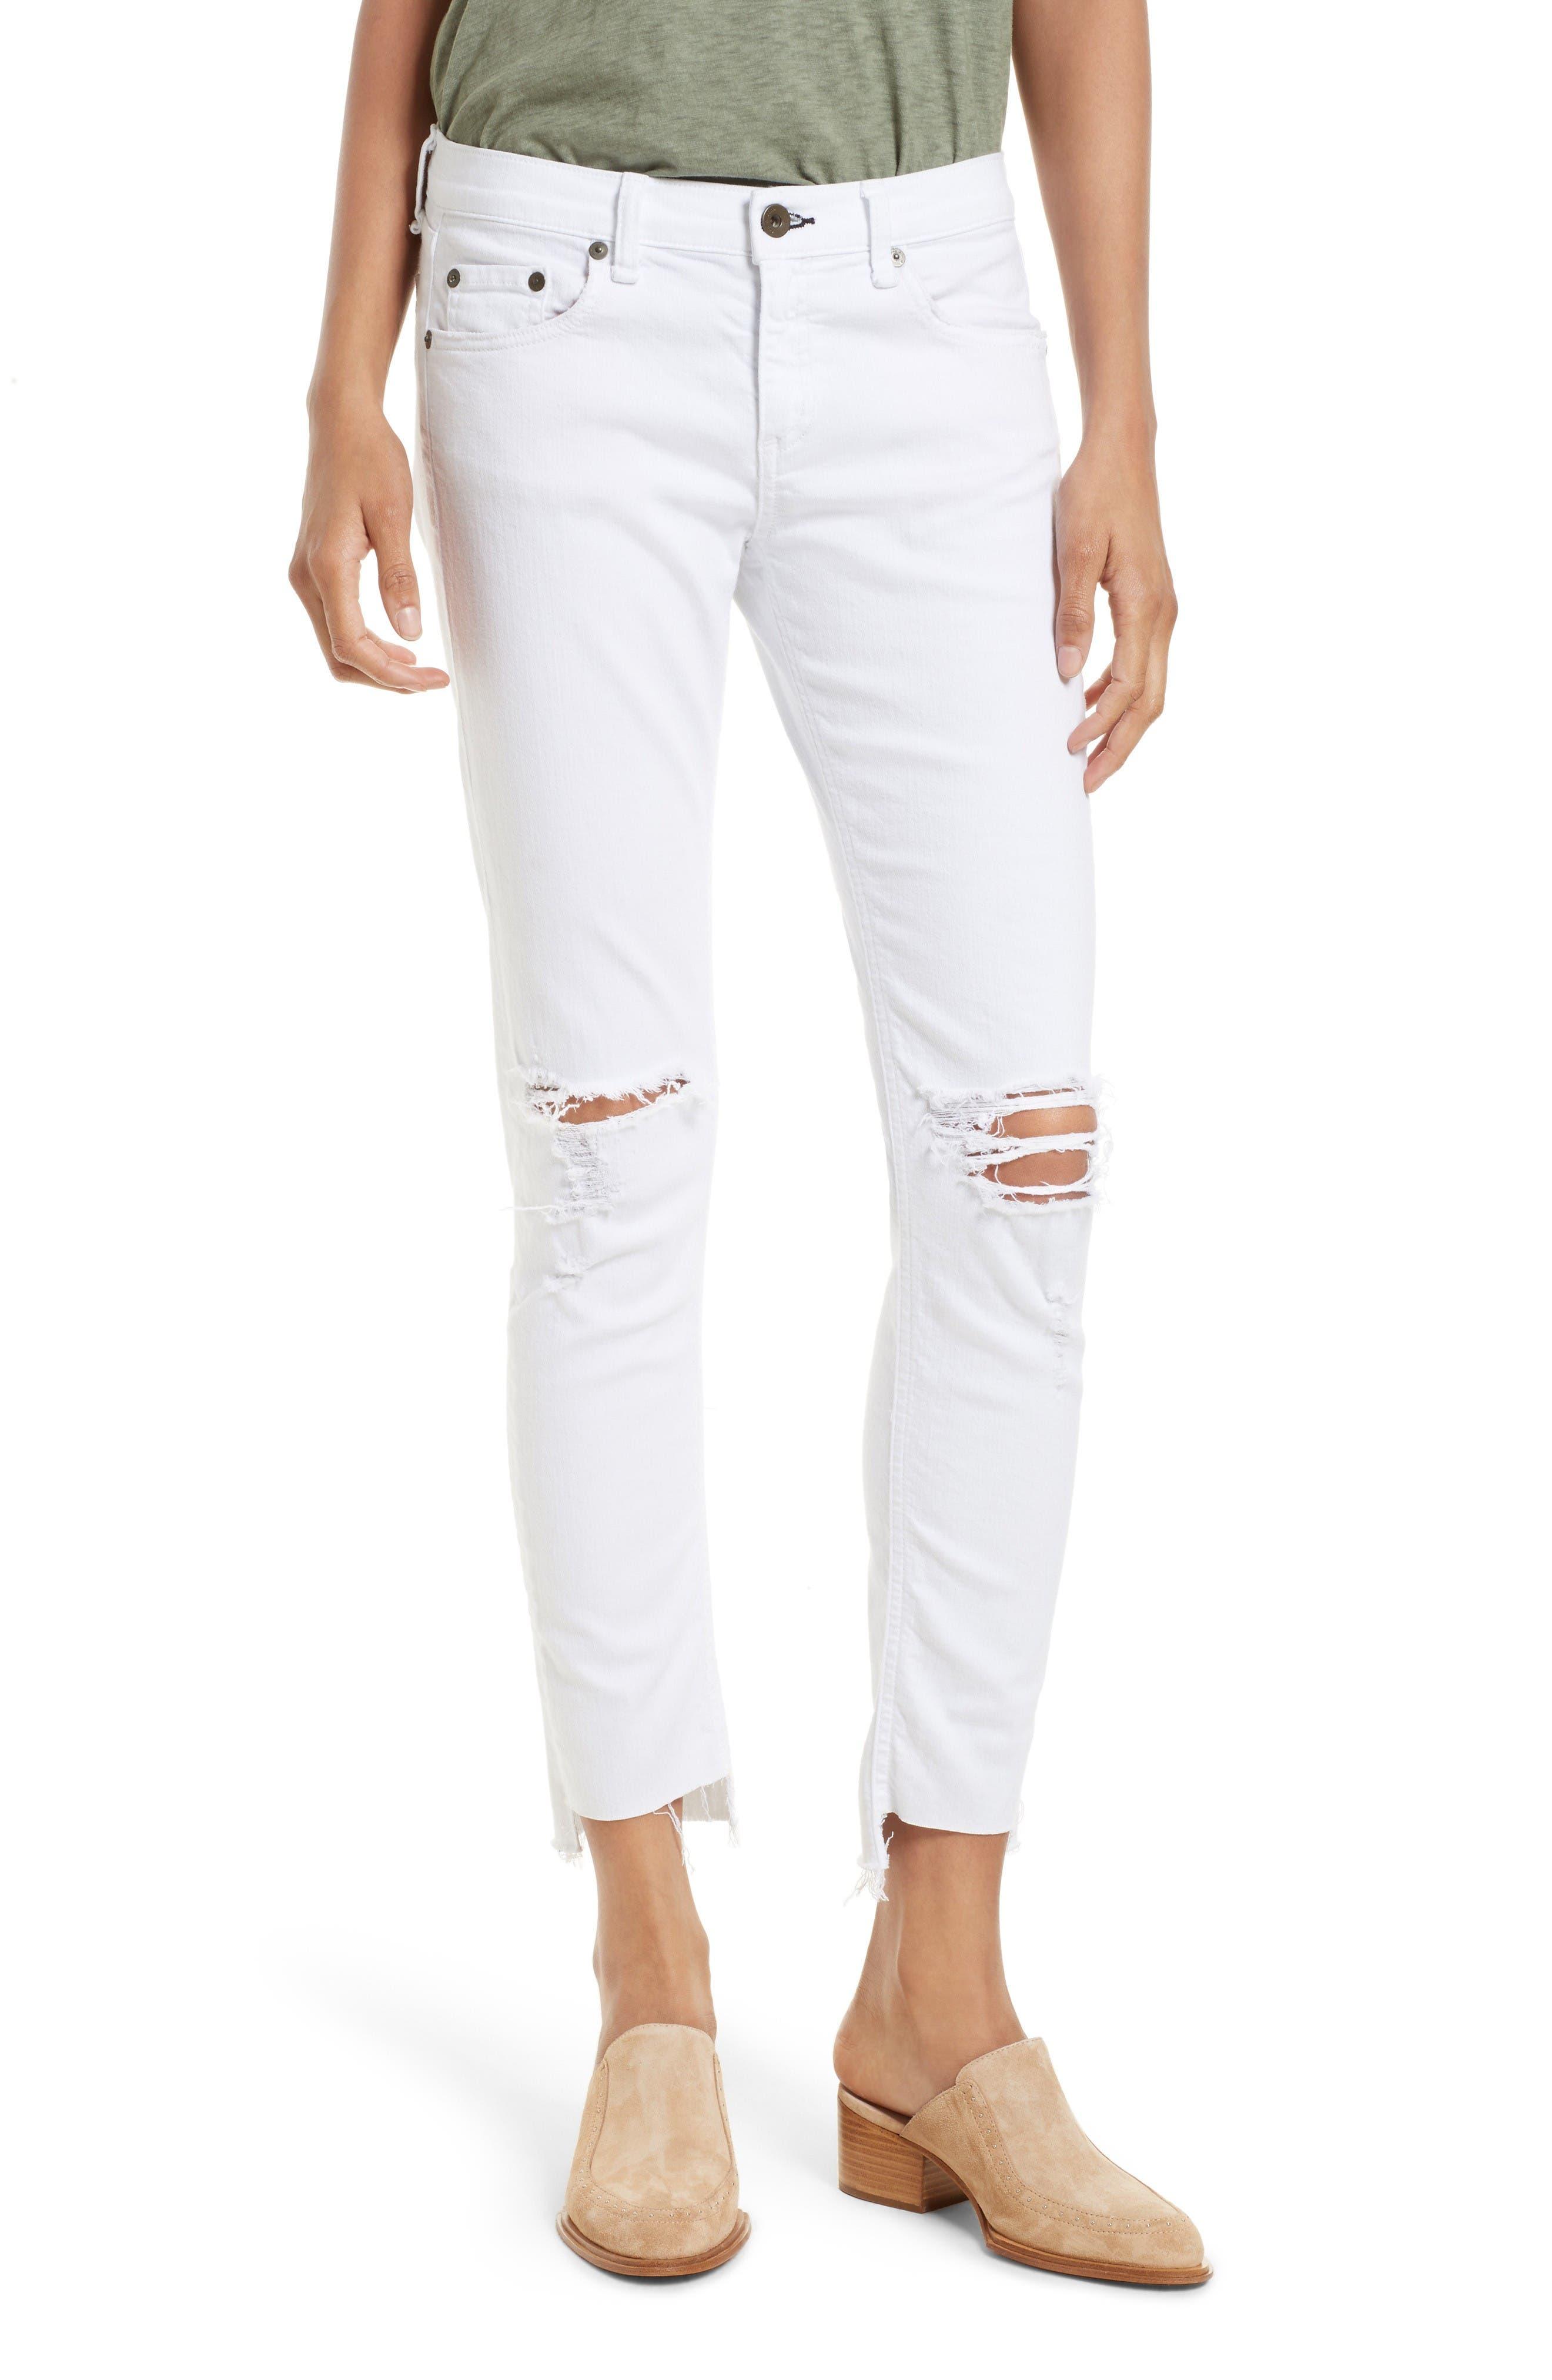 Main Image - rag & bone/JEAN The Dre Capri Slim Boyfriend Jeans (White Prospector)